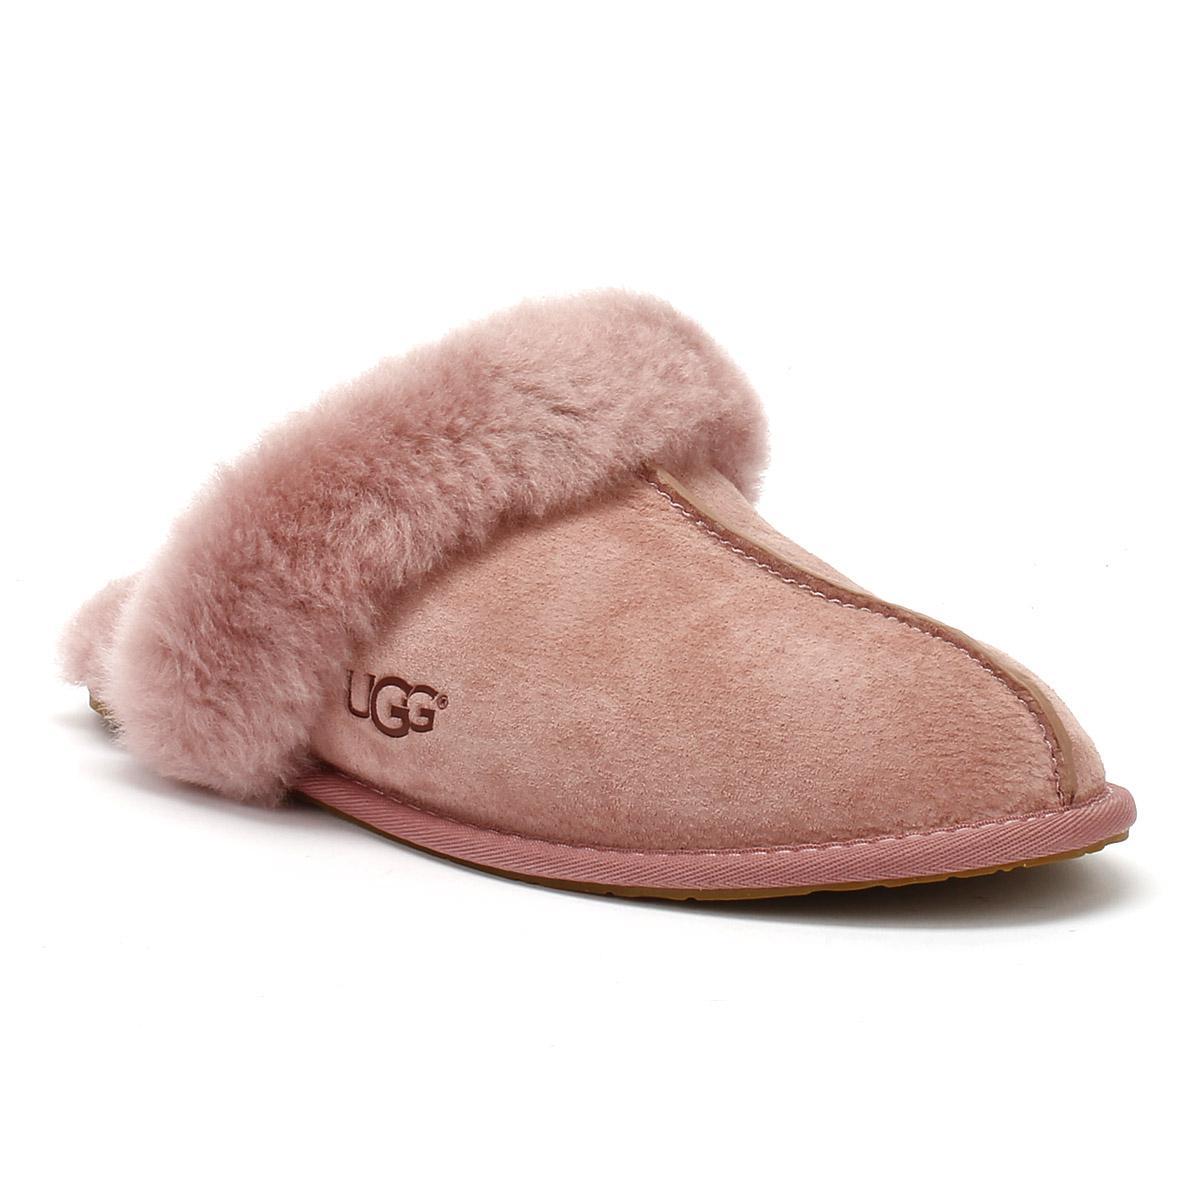 159709f50fb UGG UGG Scuffette Ii Womens Pink Dawn Slippers in Pink - Lyst